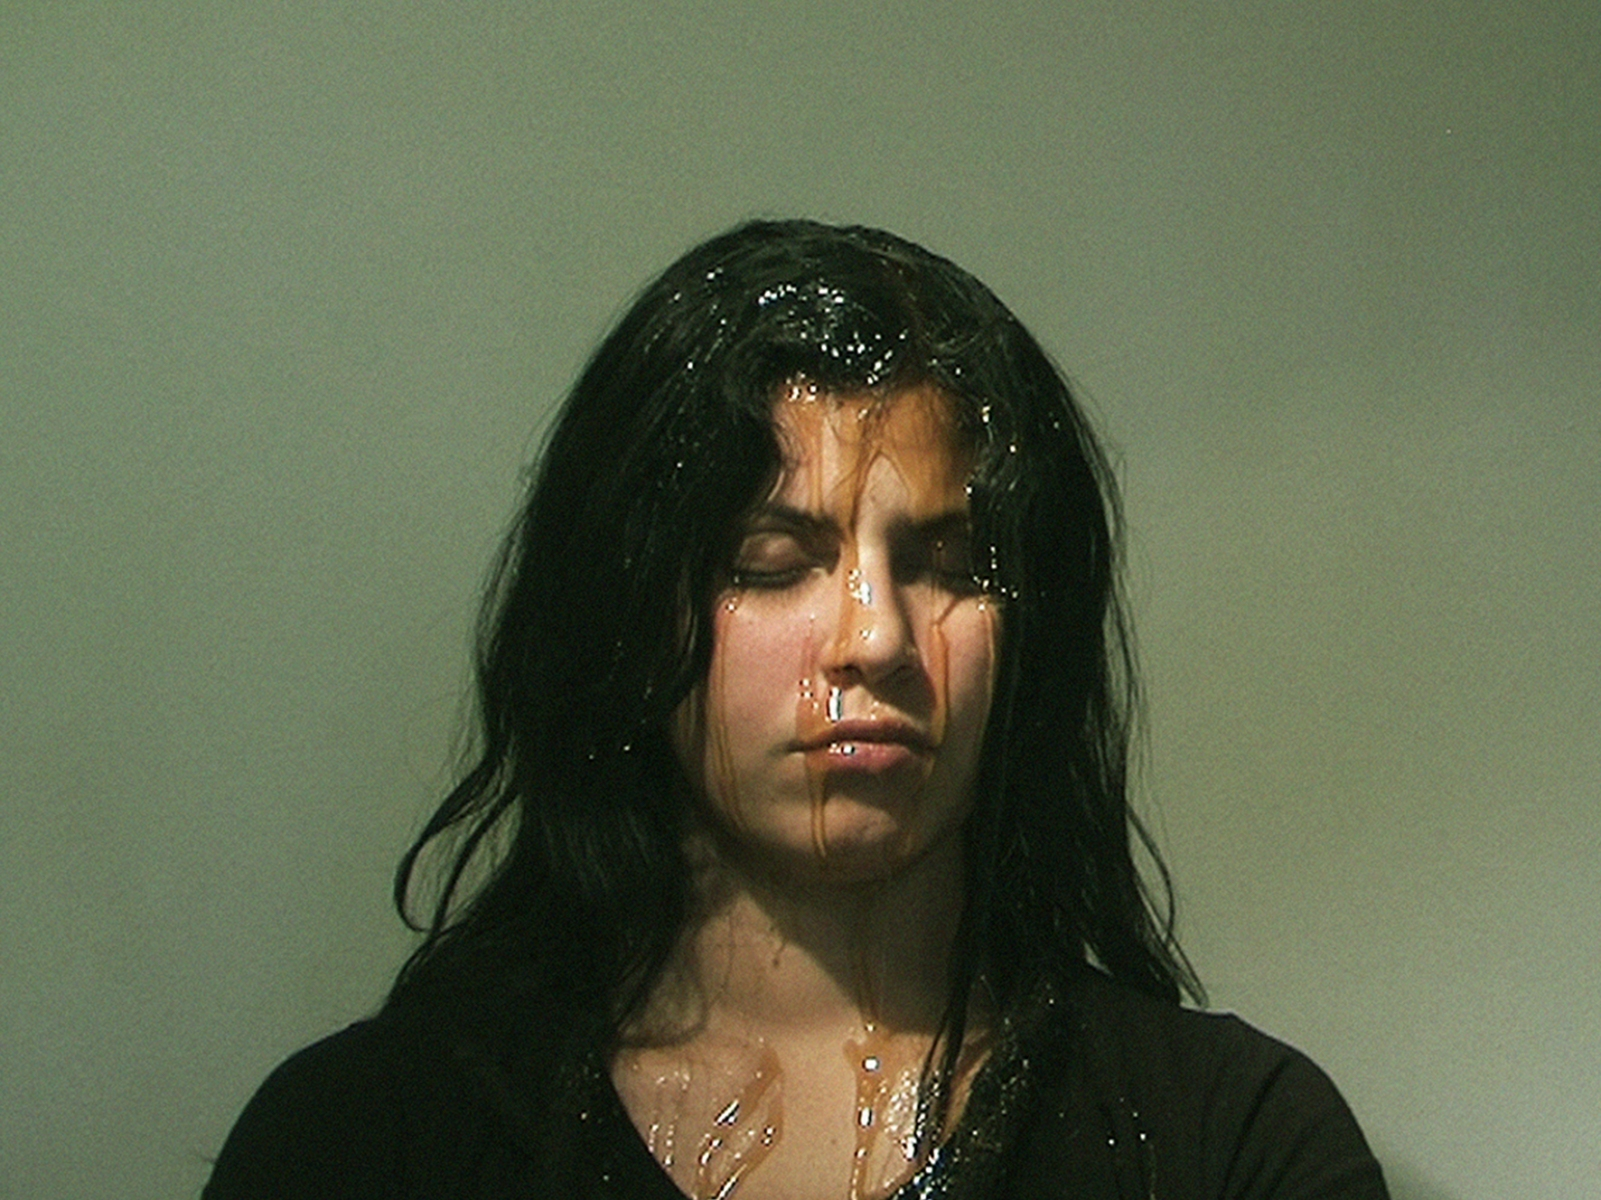 6. A drop of honey, 2013 - Performance, Video Still (Naivy Perez)